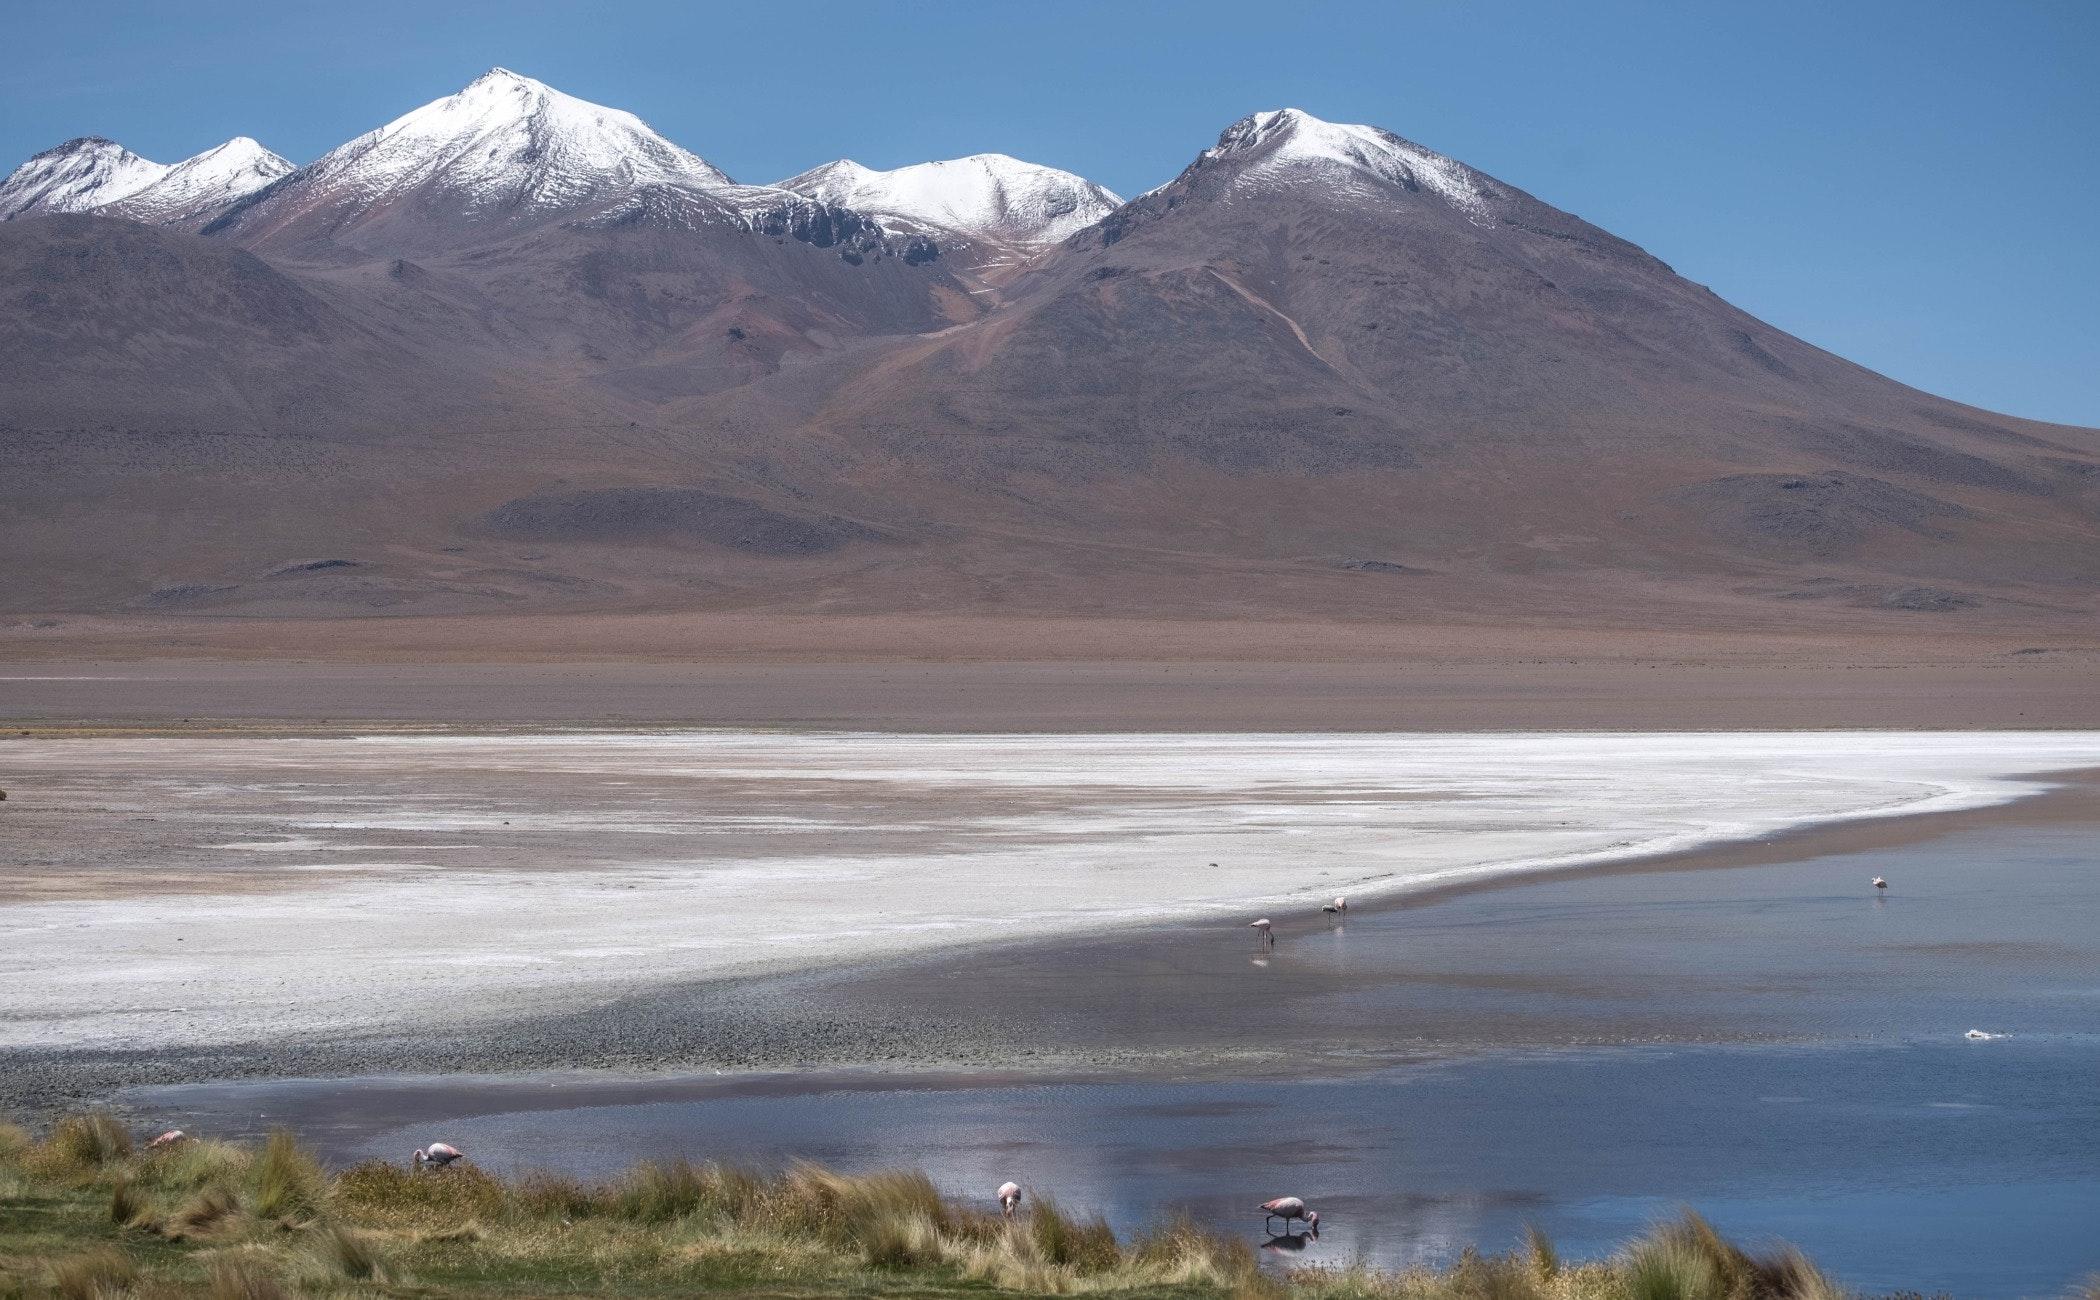 nature,mountain range,outdoors,mountain,water,promontory